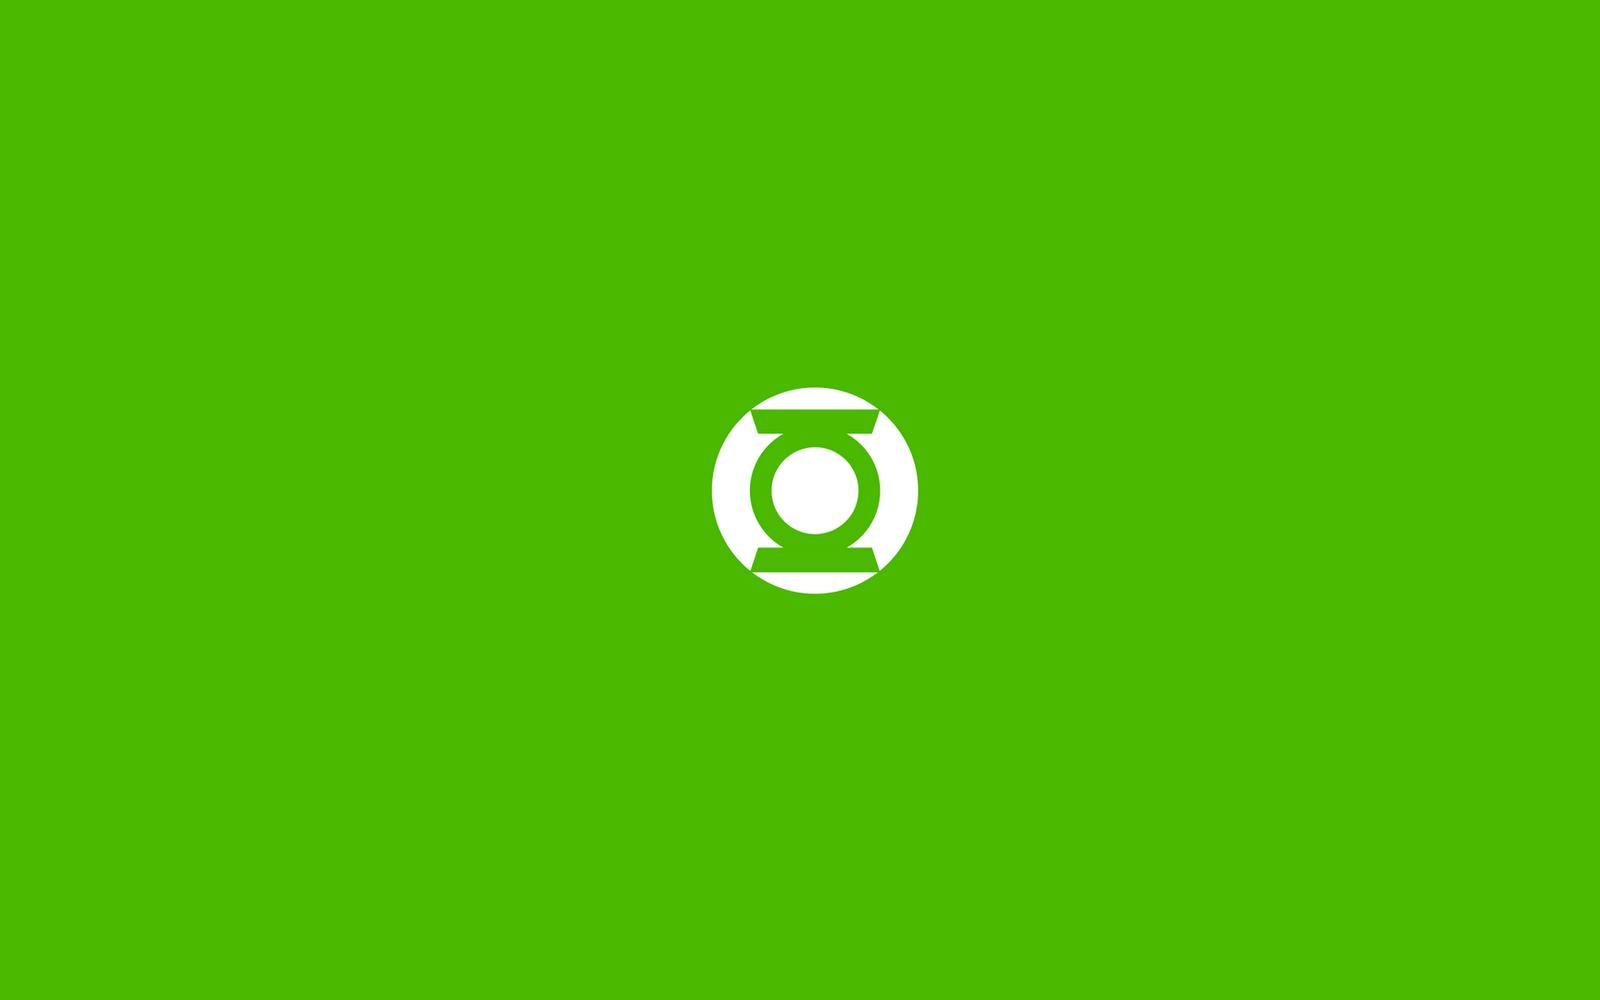 Minimalist Wallpaper Fall Green Lantern Logo Wallpapers Wallpaper Cave